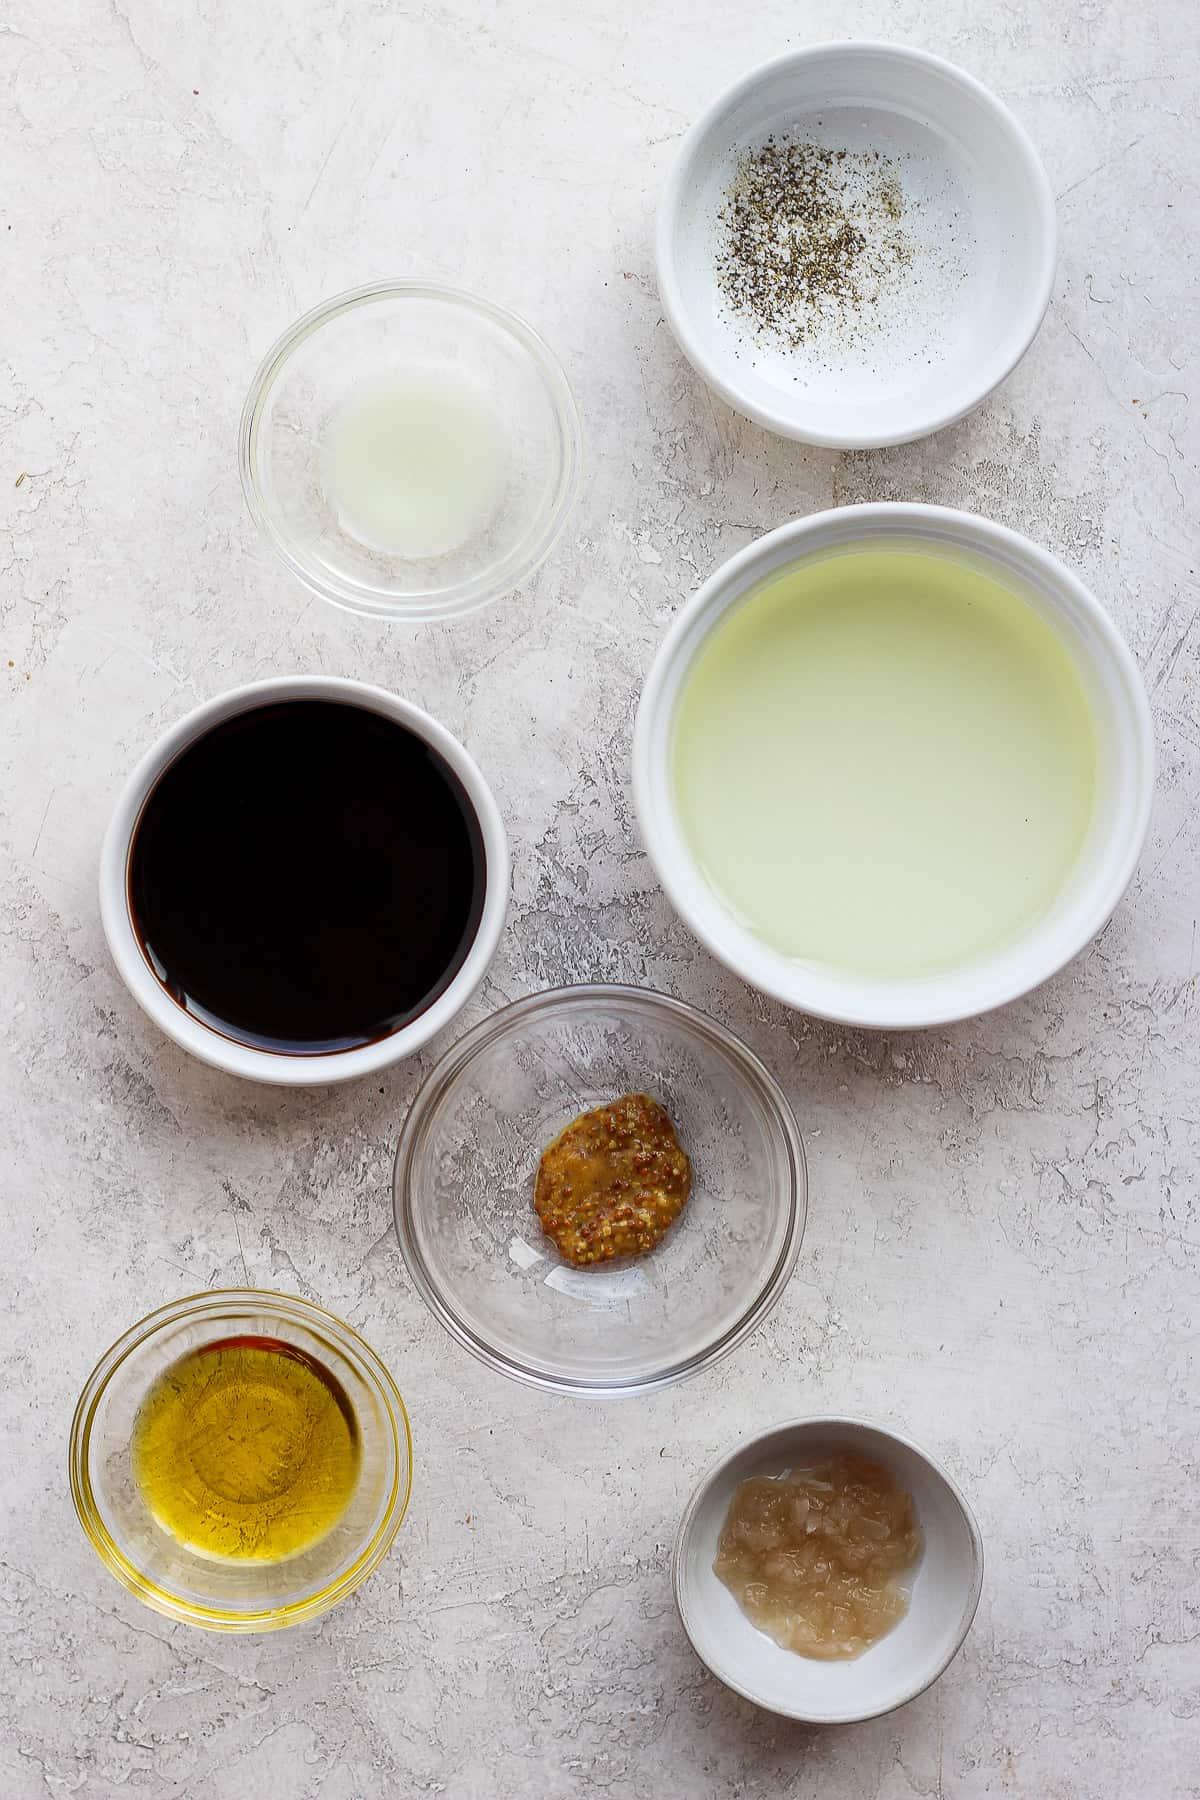 Ingredients to make easy salad dressing - broken vinaigrette